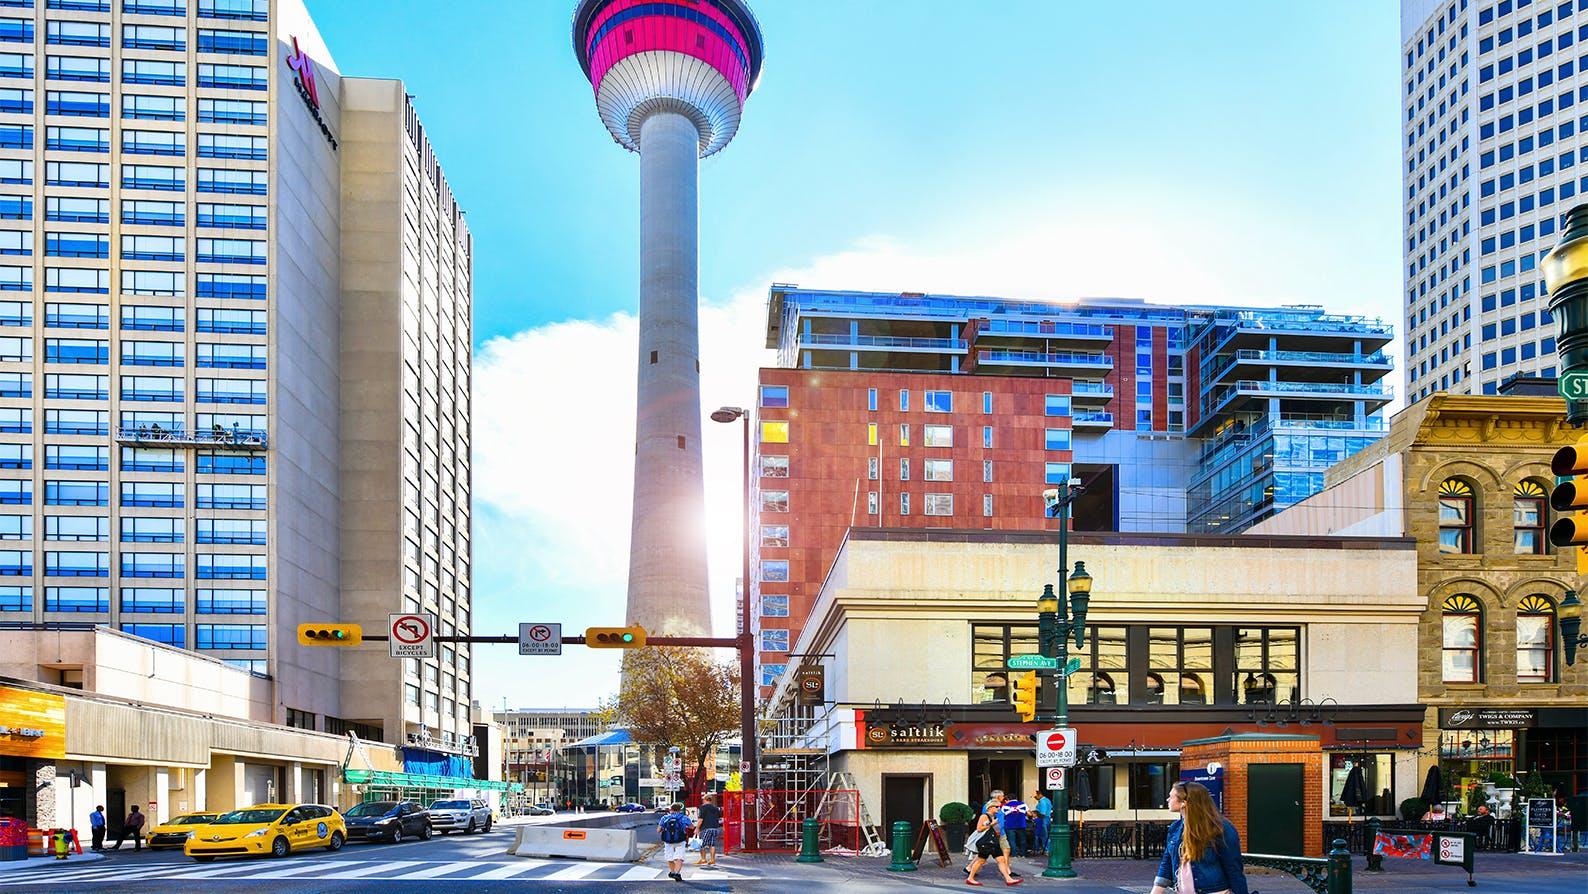 Summer in Calgary: Calgary Tower and Stephen Avenue